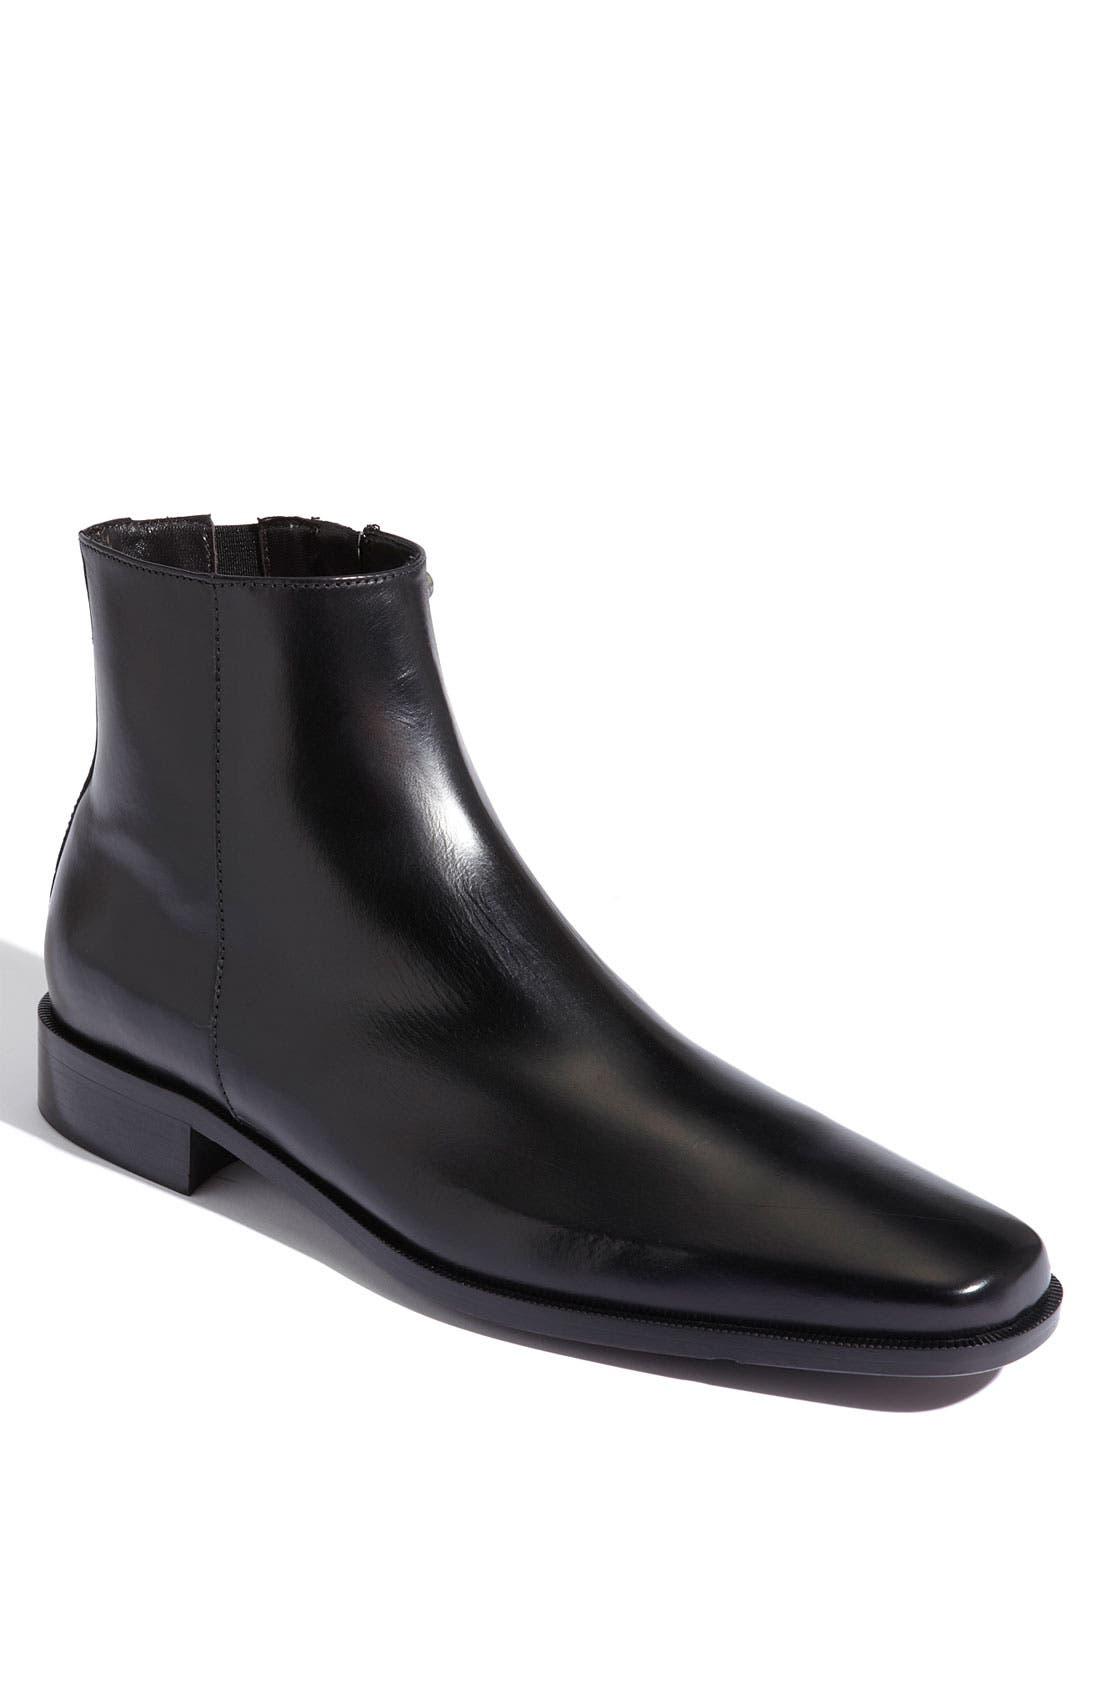 Alternate Image 1 Selected - Donald J Pliner 'Ring' Boot